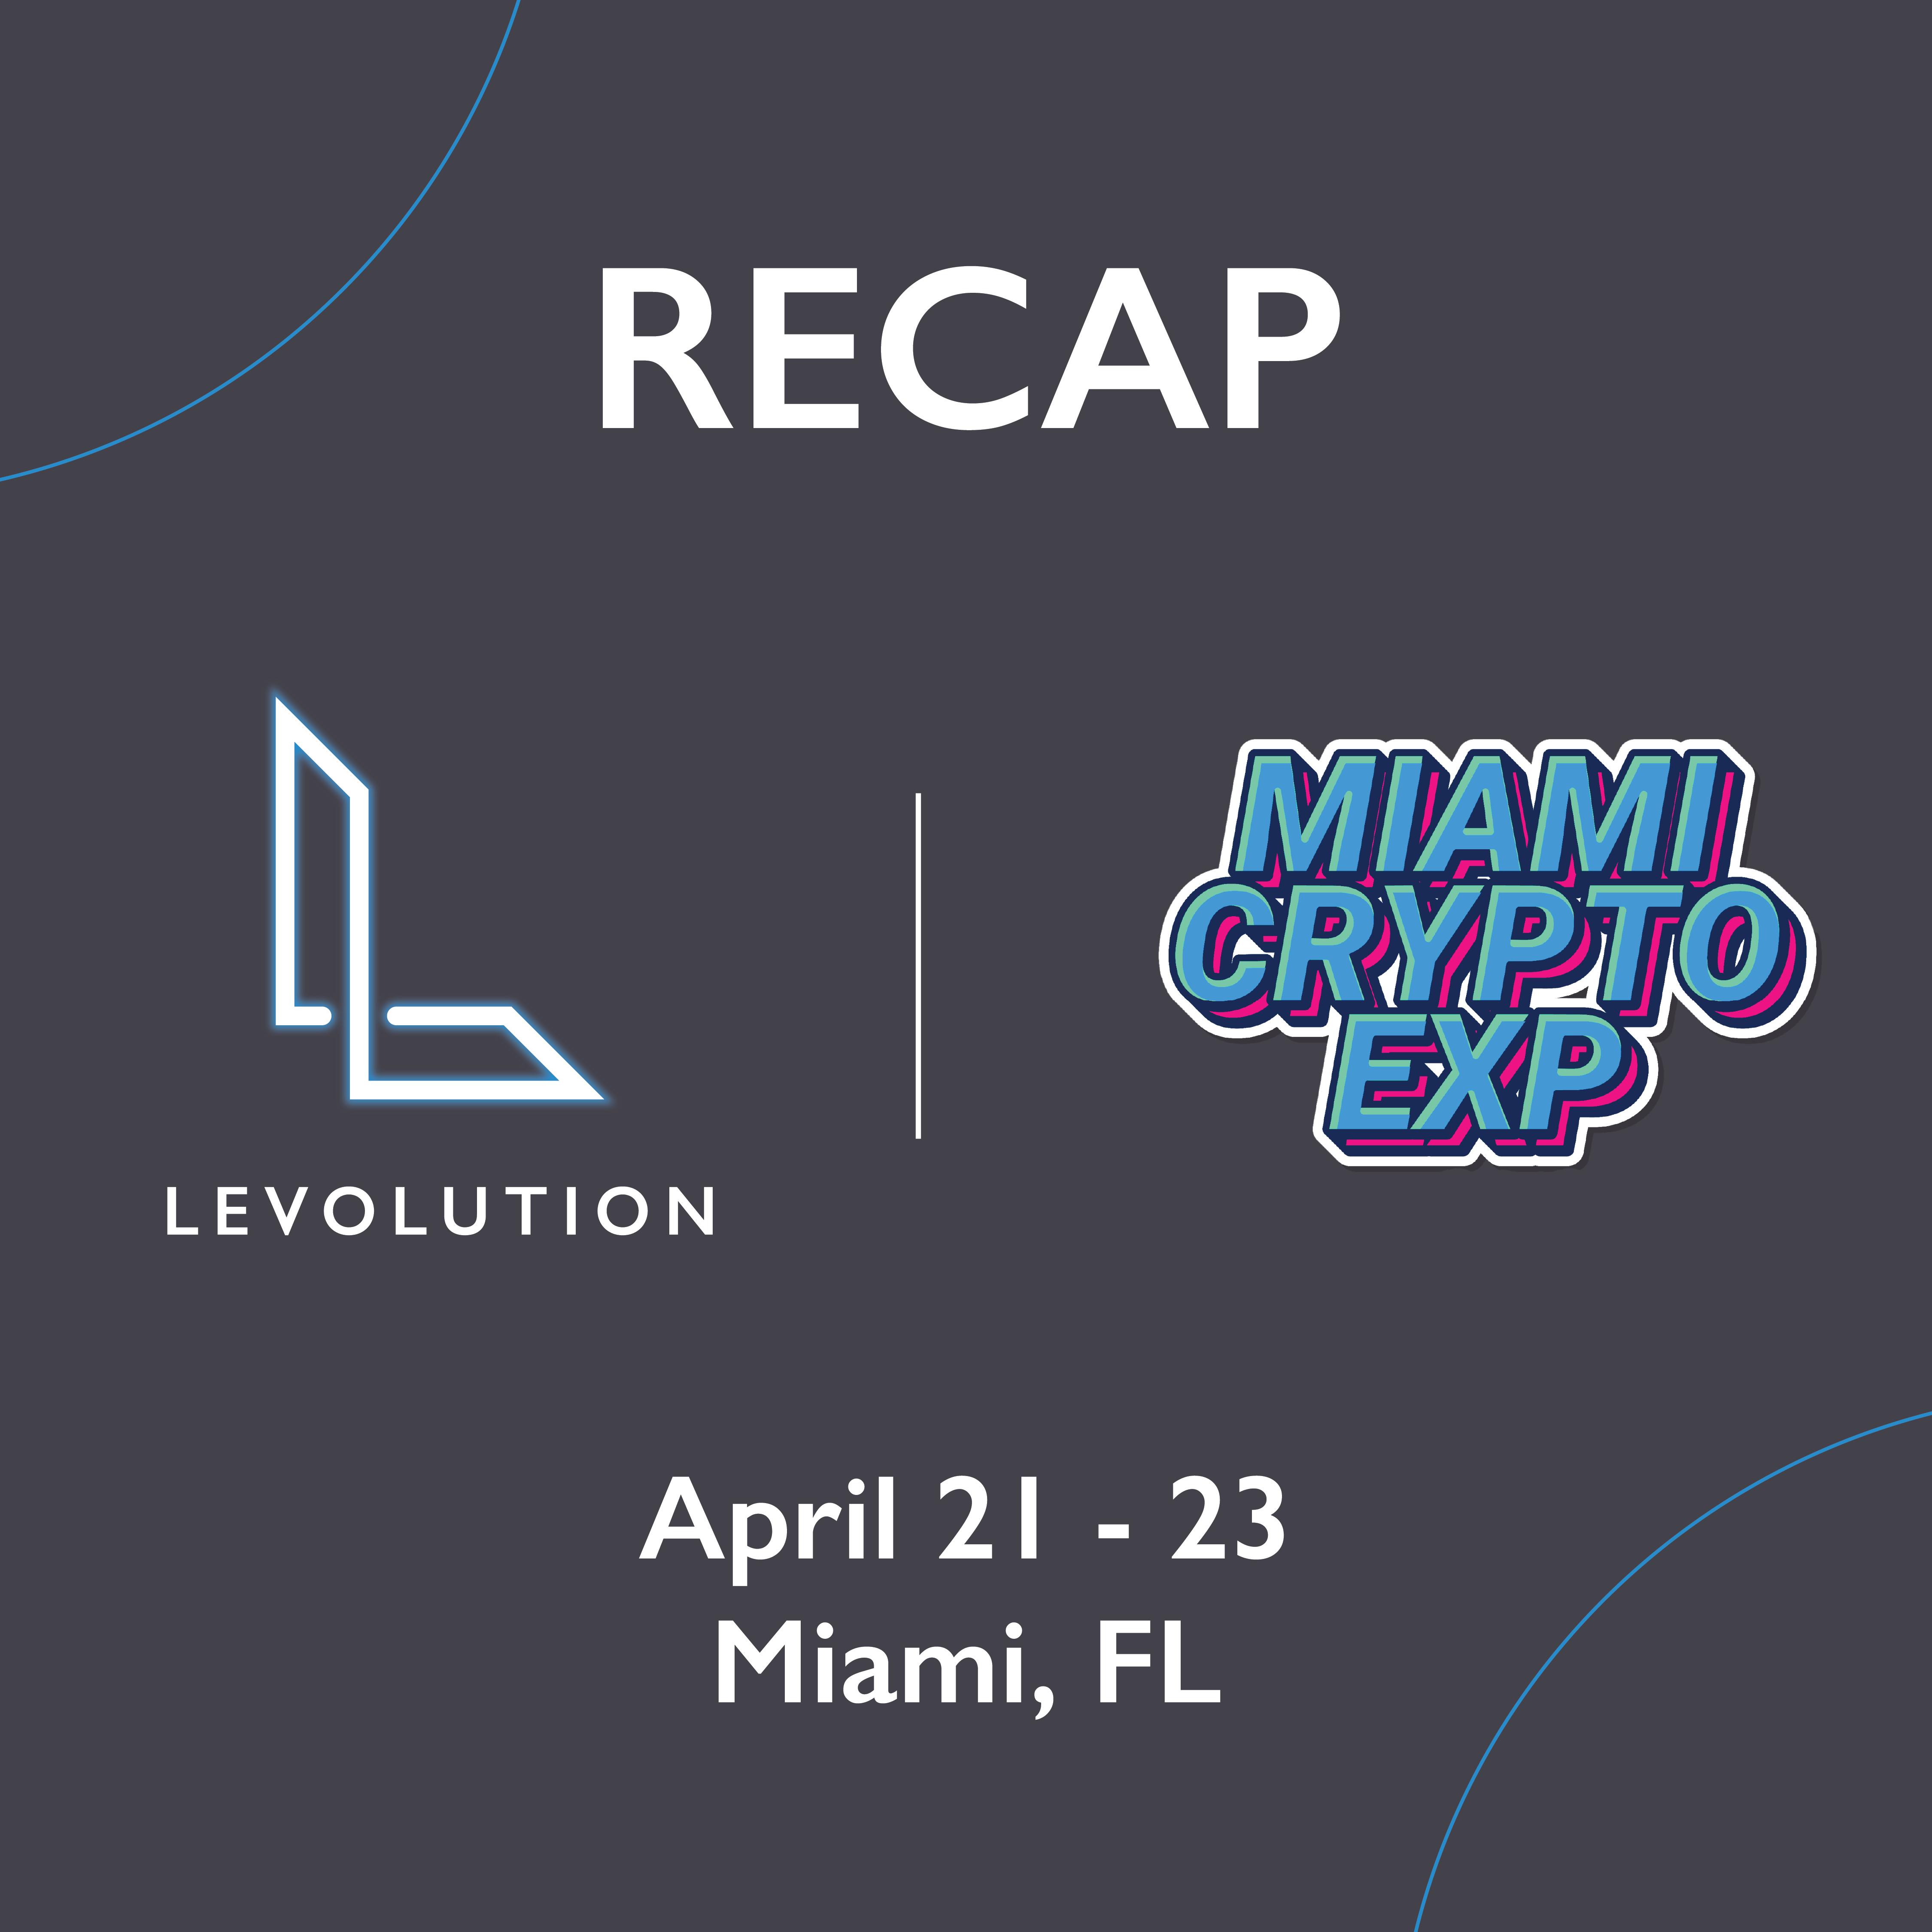 Levolution's Key Takeaways From the Miami Crypto Experience